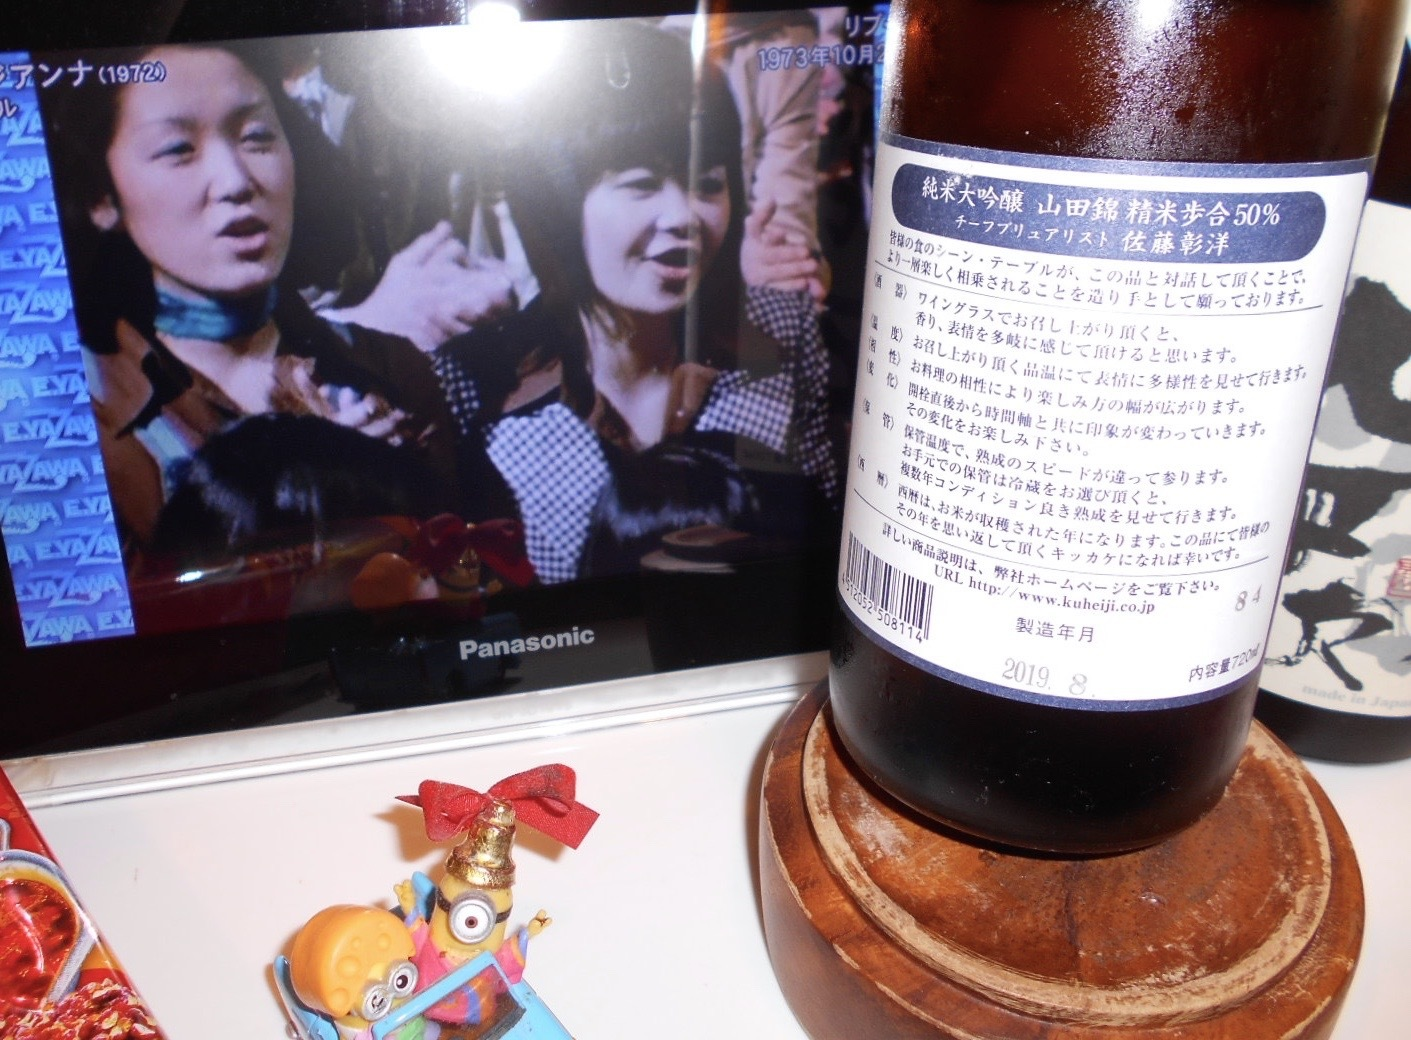 kuheiji_yamada50_30by2.jpg